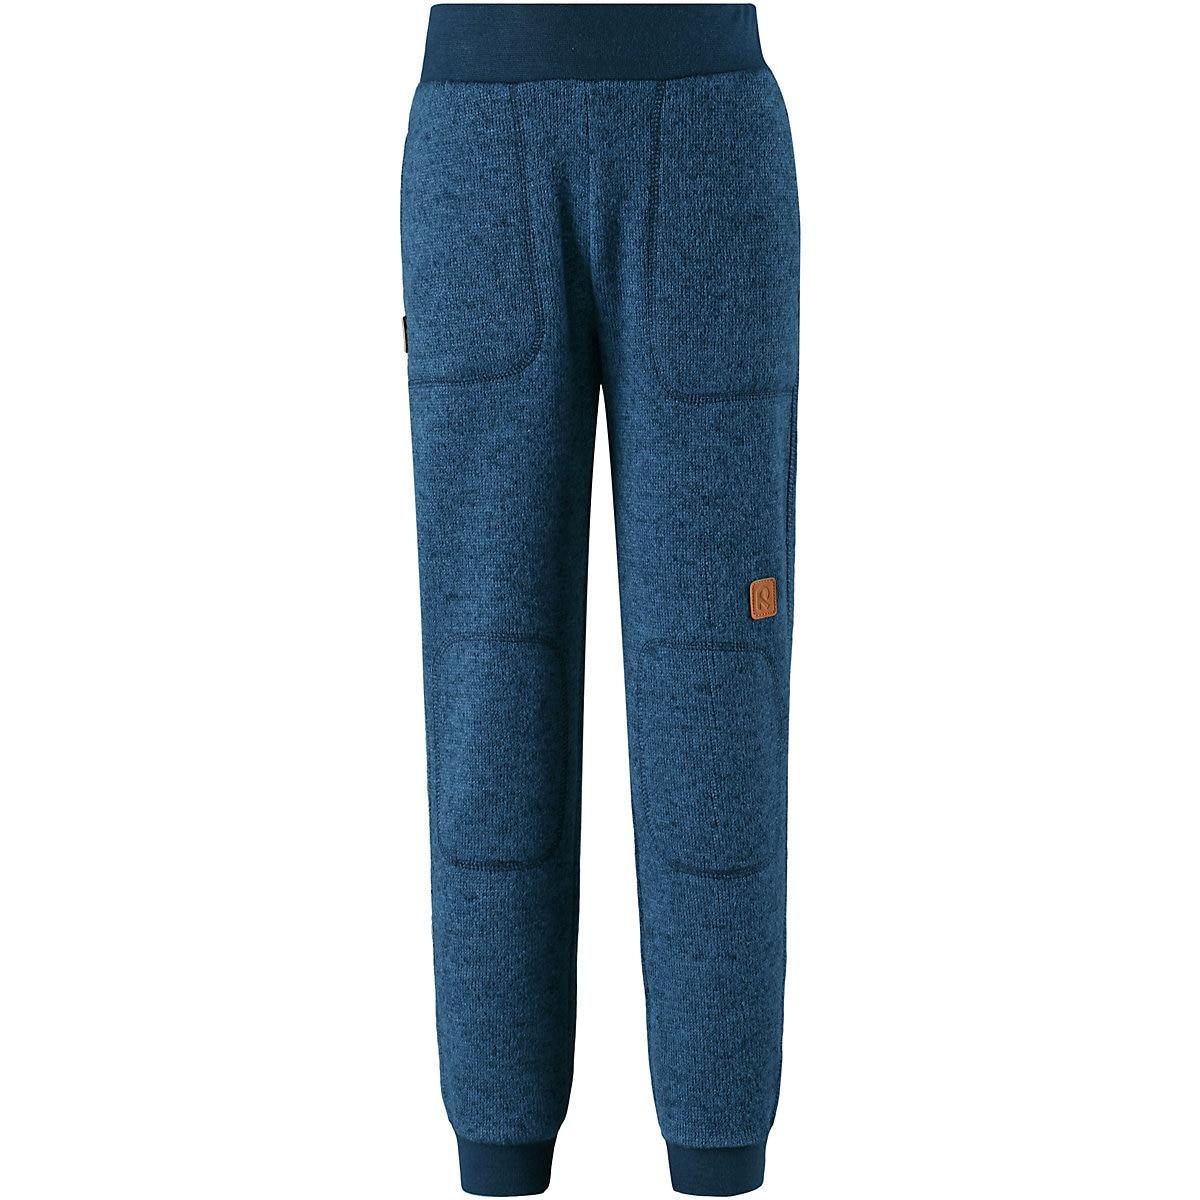 Pants & Capris Reima 8637109 for boys polyester autumn winter uanloe 2017 autumn white hole ripped jeans women jeggings cool denim high waist pants capris female skinny black casual jeans